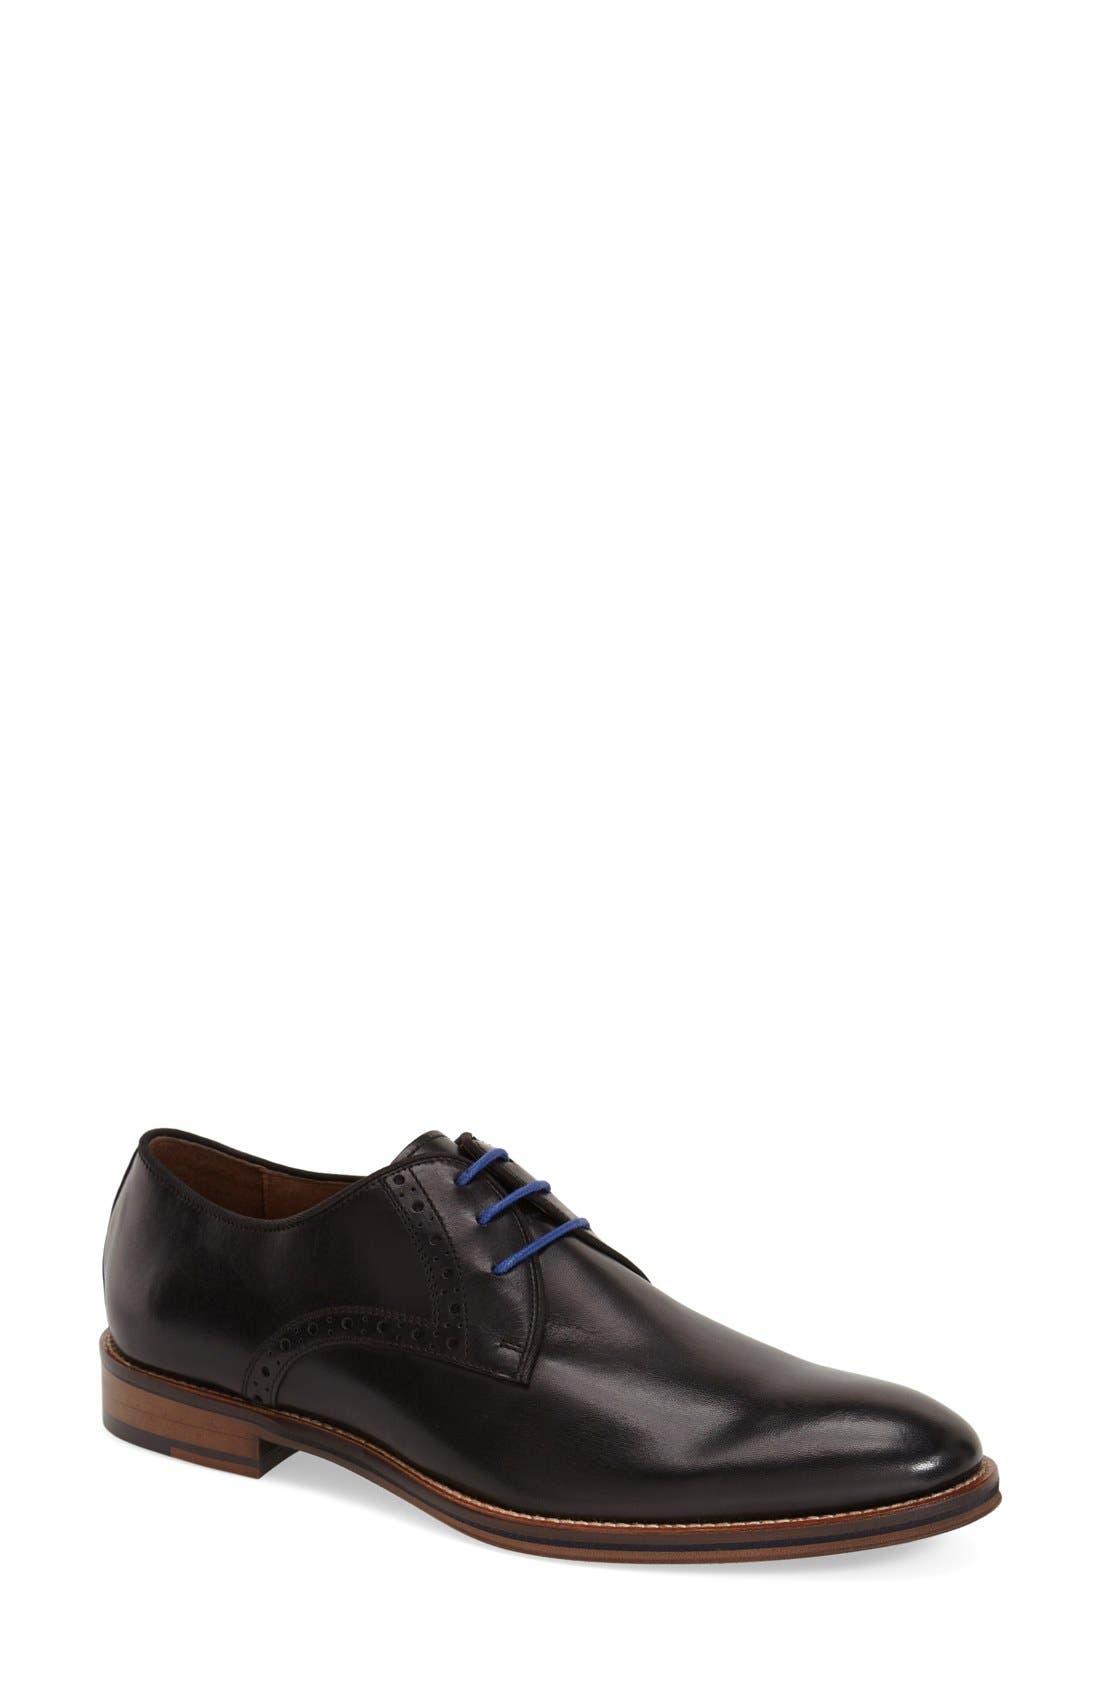 JOHNSTON & MURPHY Conard Plain Toe Derby, Main, color, BLACK